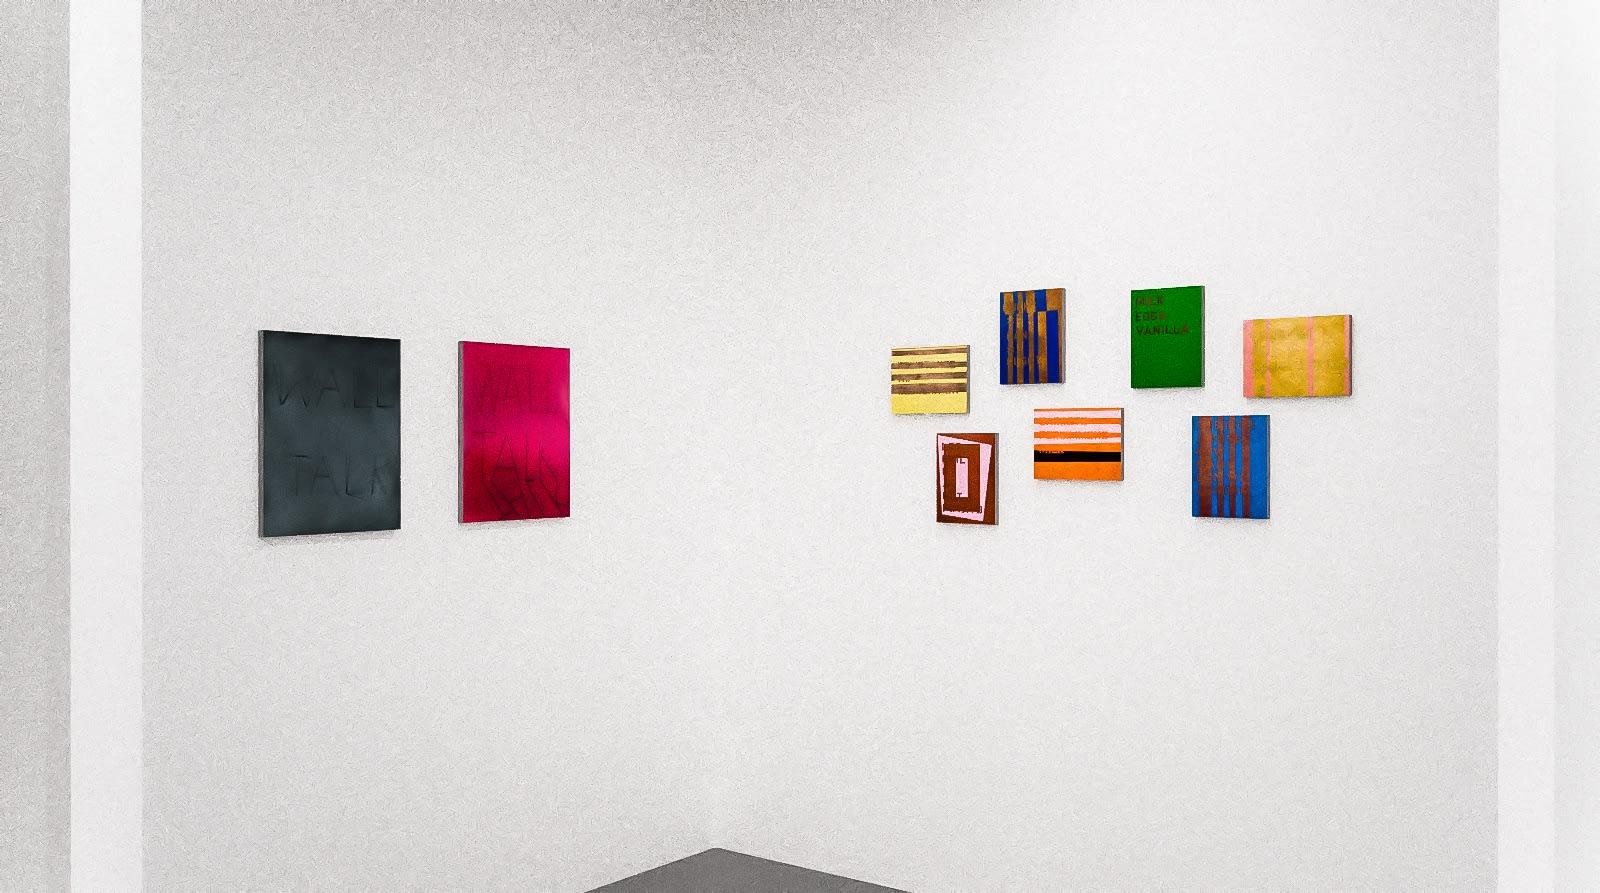 Scott Reeder, and Patrick Chamberlain in The Written Word (virtual exhibition view), 2020, Kavi Gupta